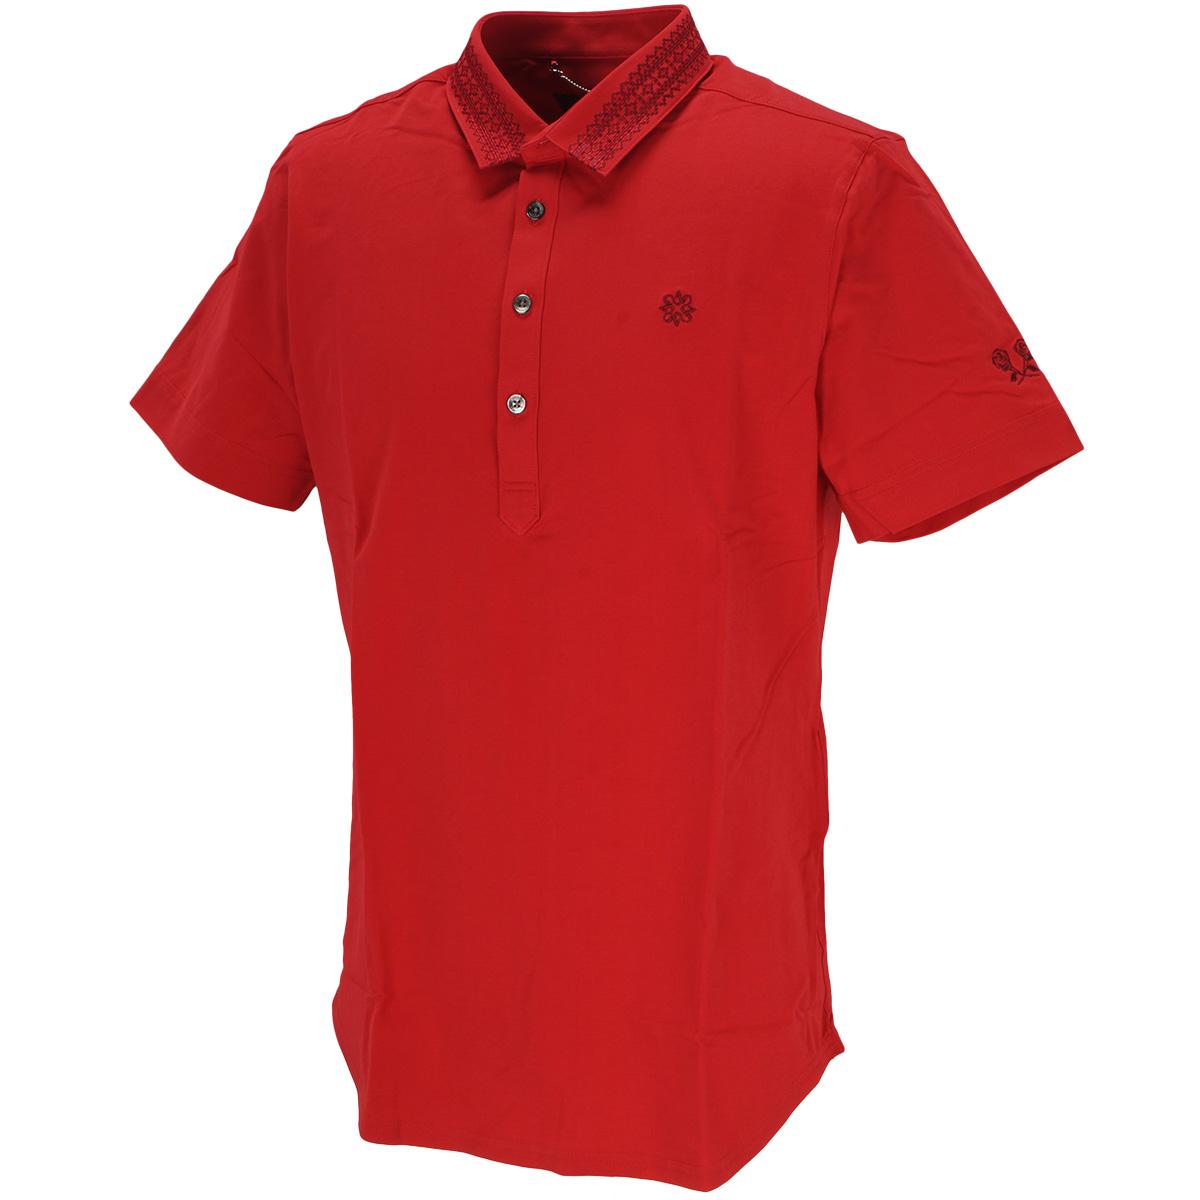 BlackLabel 鹿の子塩縮加工 半袖ポロシャツ